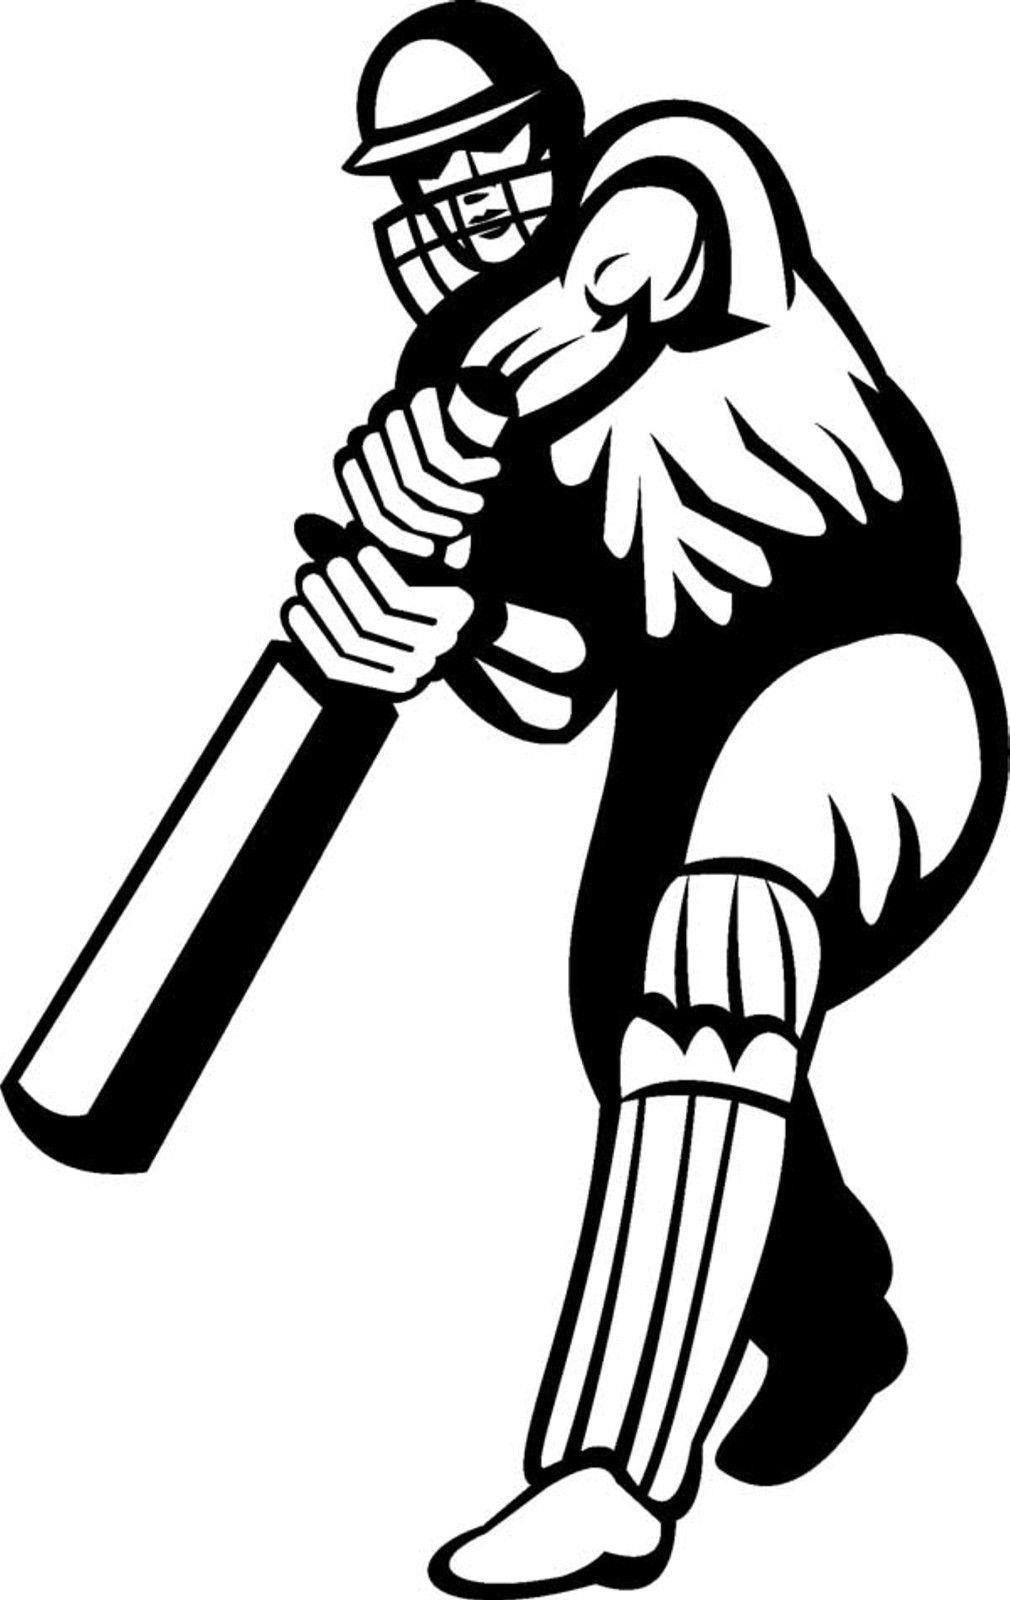 13 95 Aud Cricket Batsman Vinyl Sport Wall Art Sticker Decal Home Decor Boy Bedroom Ebay Home Garden Sports Wall Art Cricket Poster Sticker Wall Art